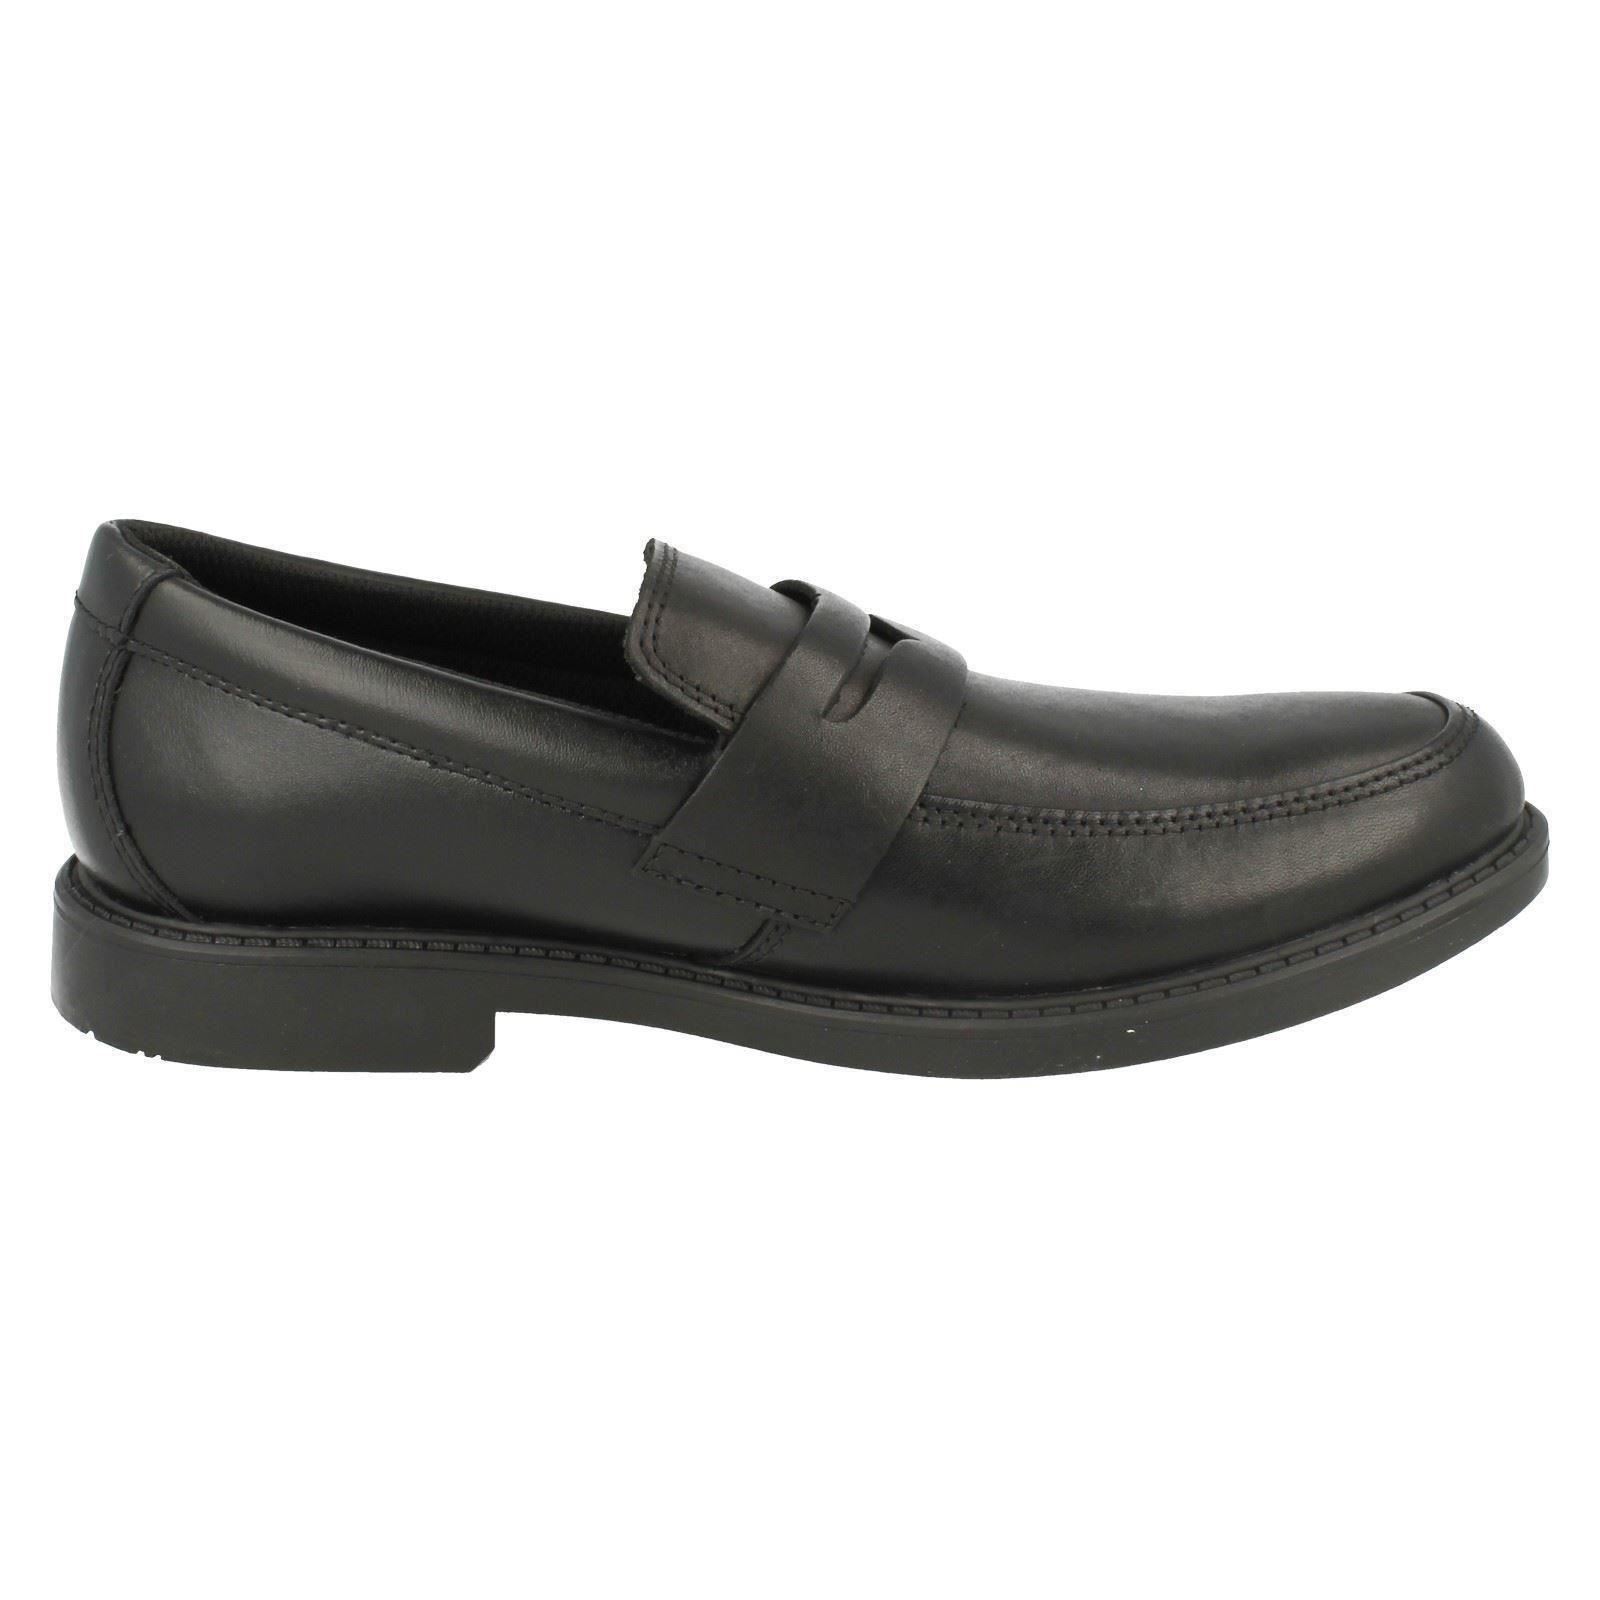 Chicos Clarks Zapatos Escolares Slip On Zayne